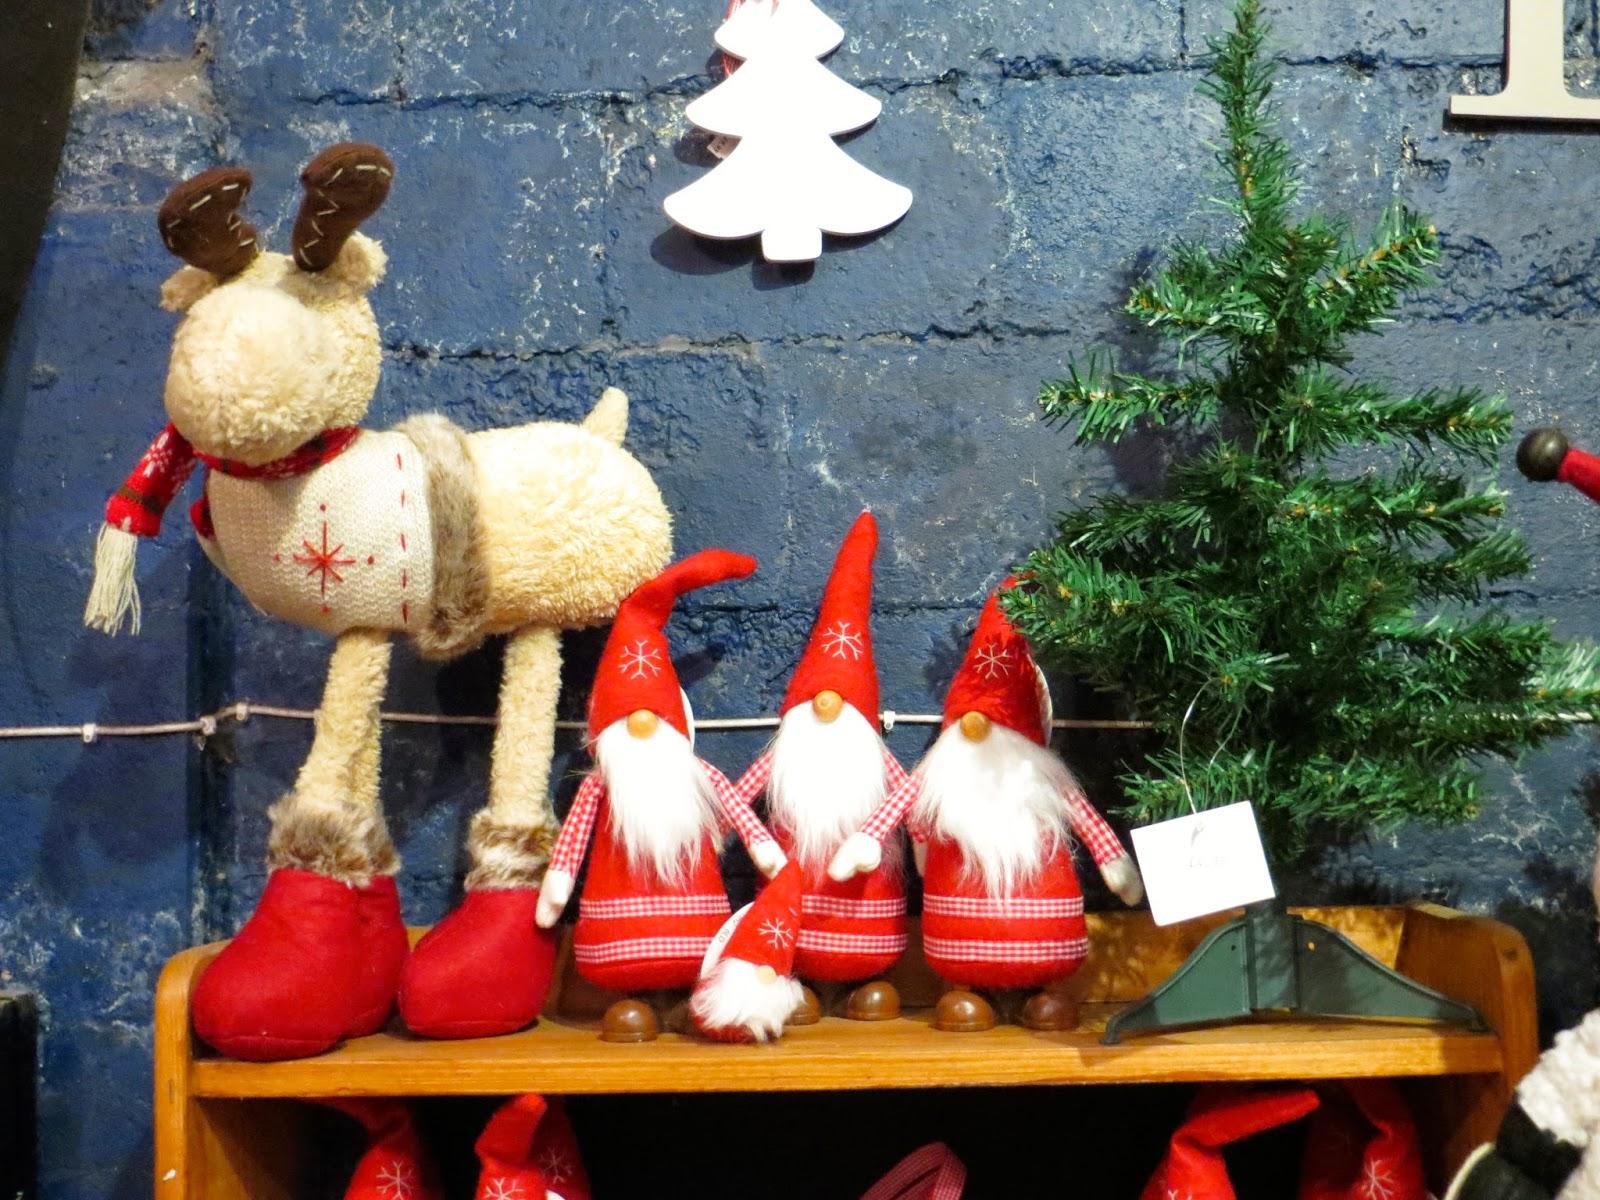 Watlington hill christmas common gifts